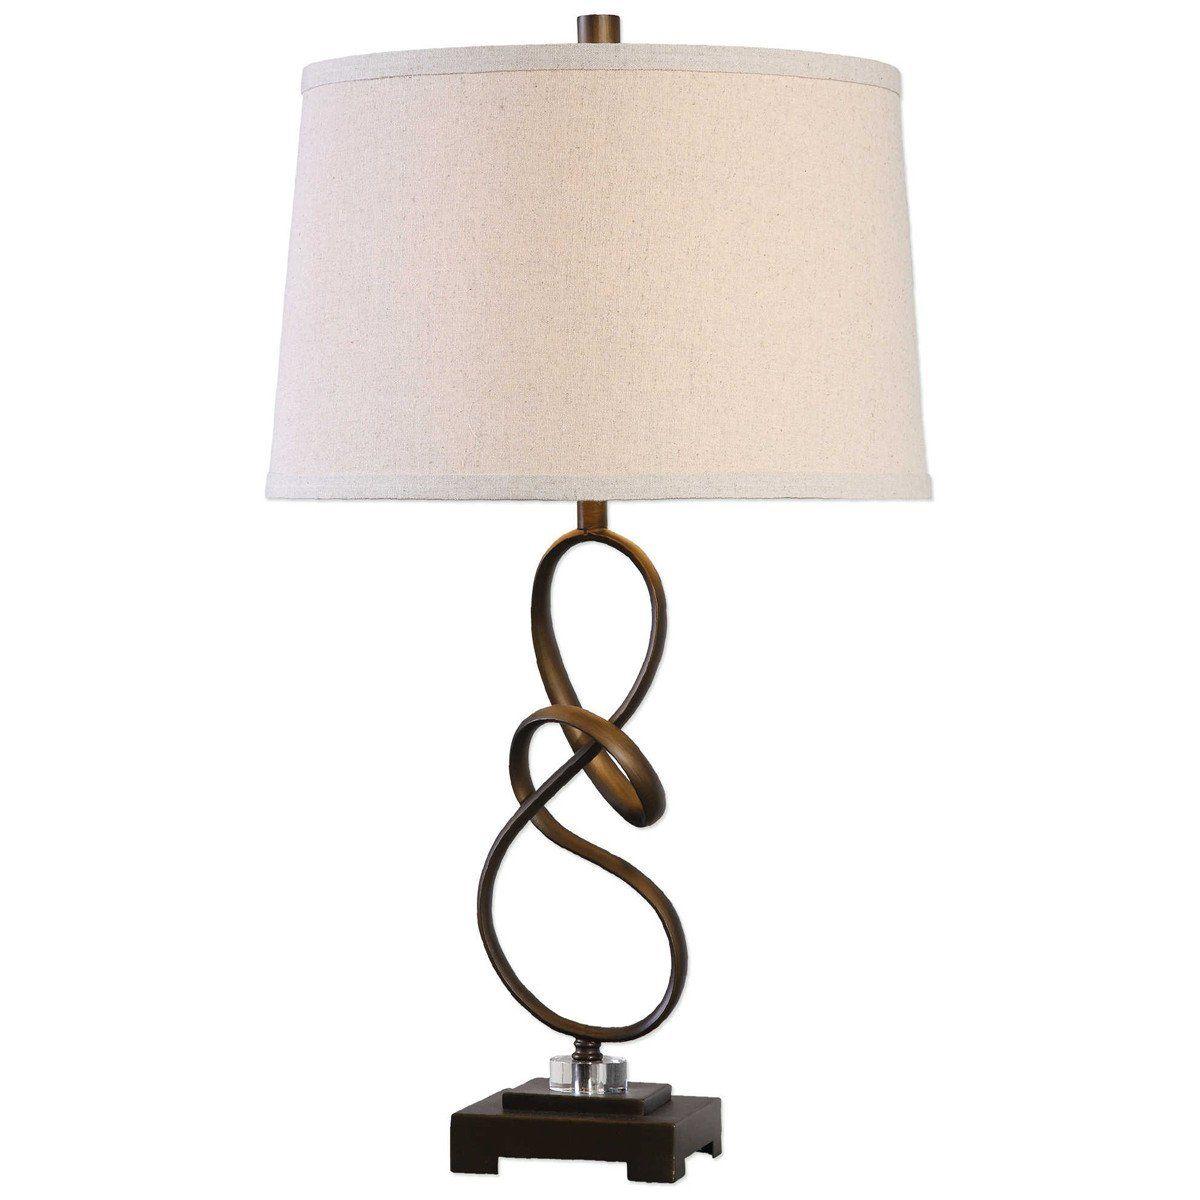 Uttermost Tenley Oil Rubbed Bronze Lamp